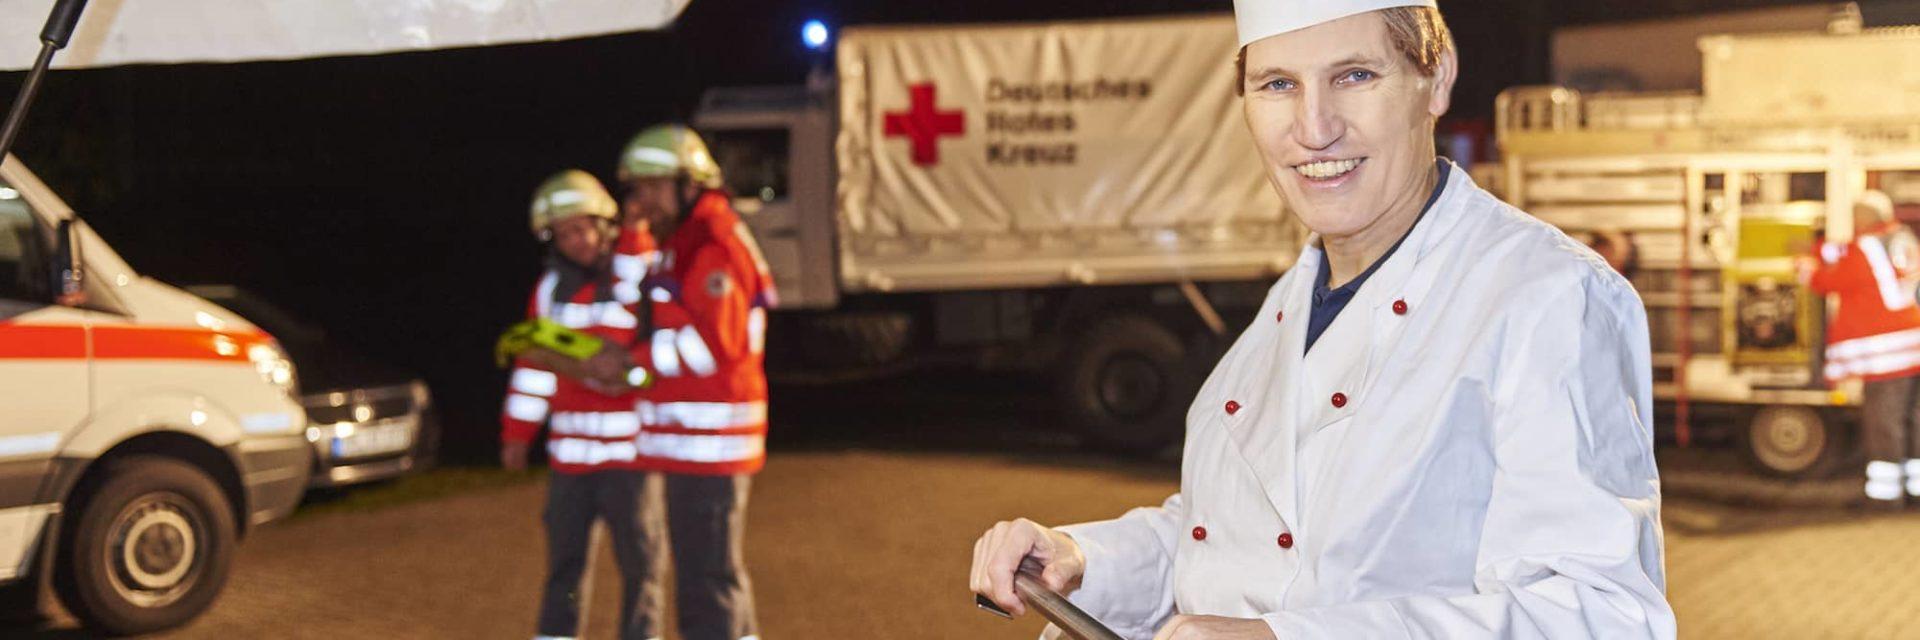 Deutsches Rotes Kreuz Bremen, Katastrophenschutz